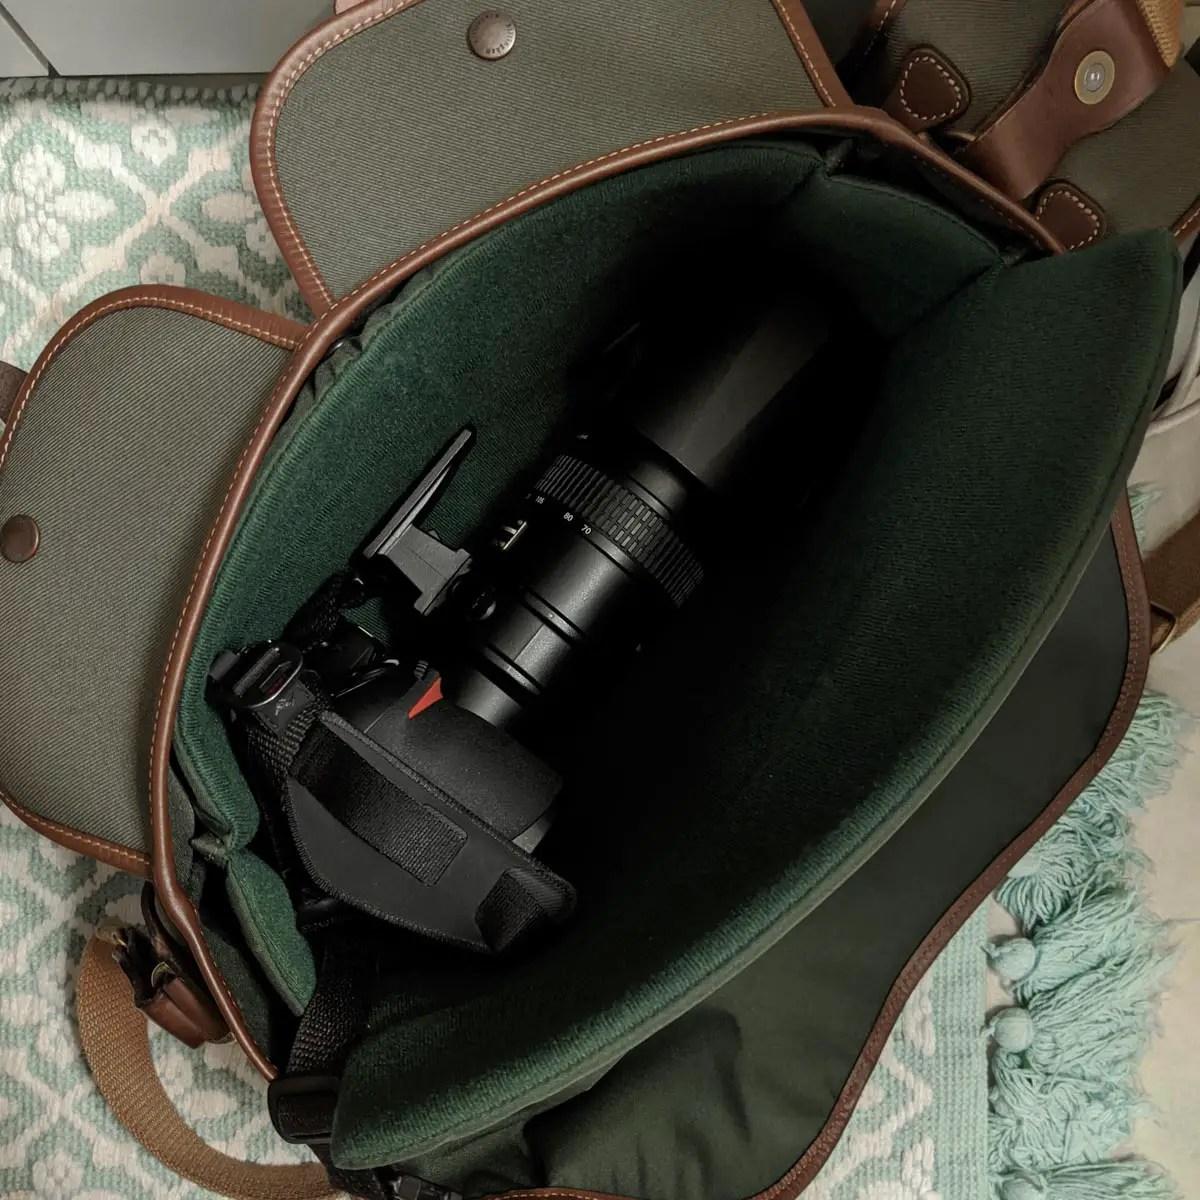 Billingham Hadley Pro 2020 - Nikon F6 and 70-200 loaded!